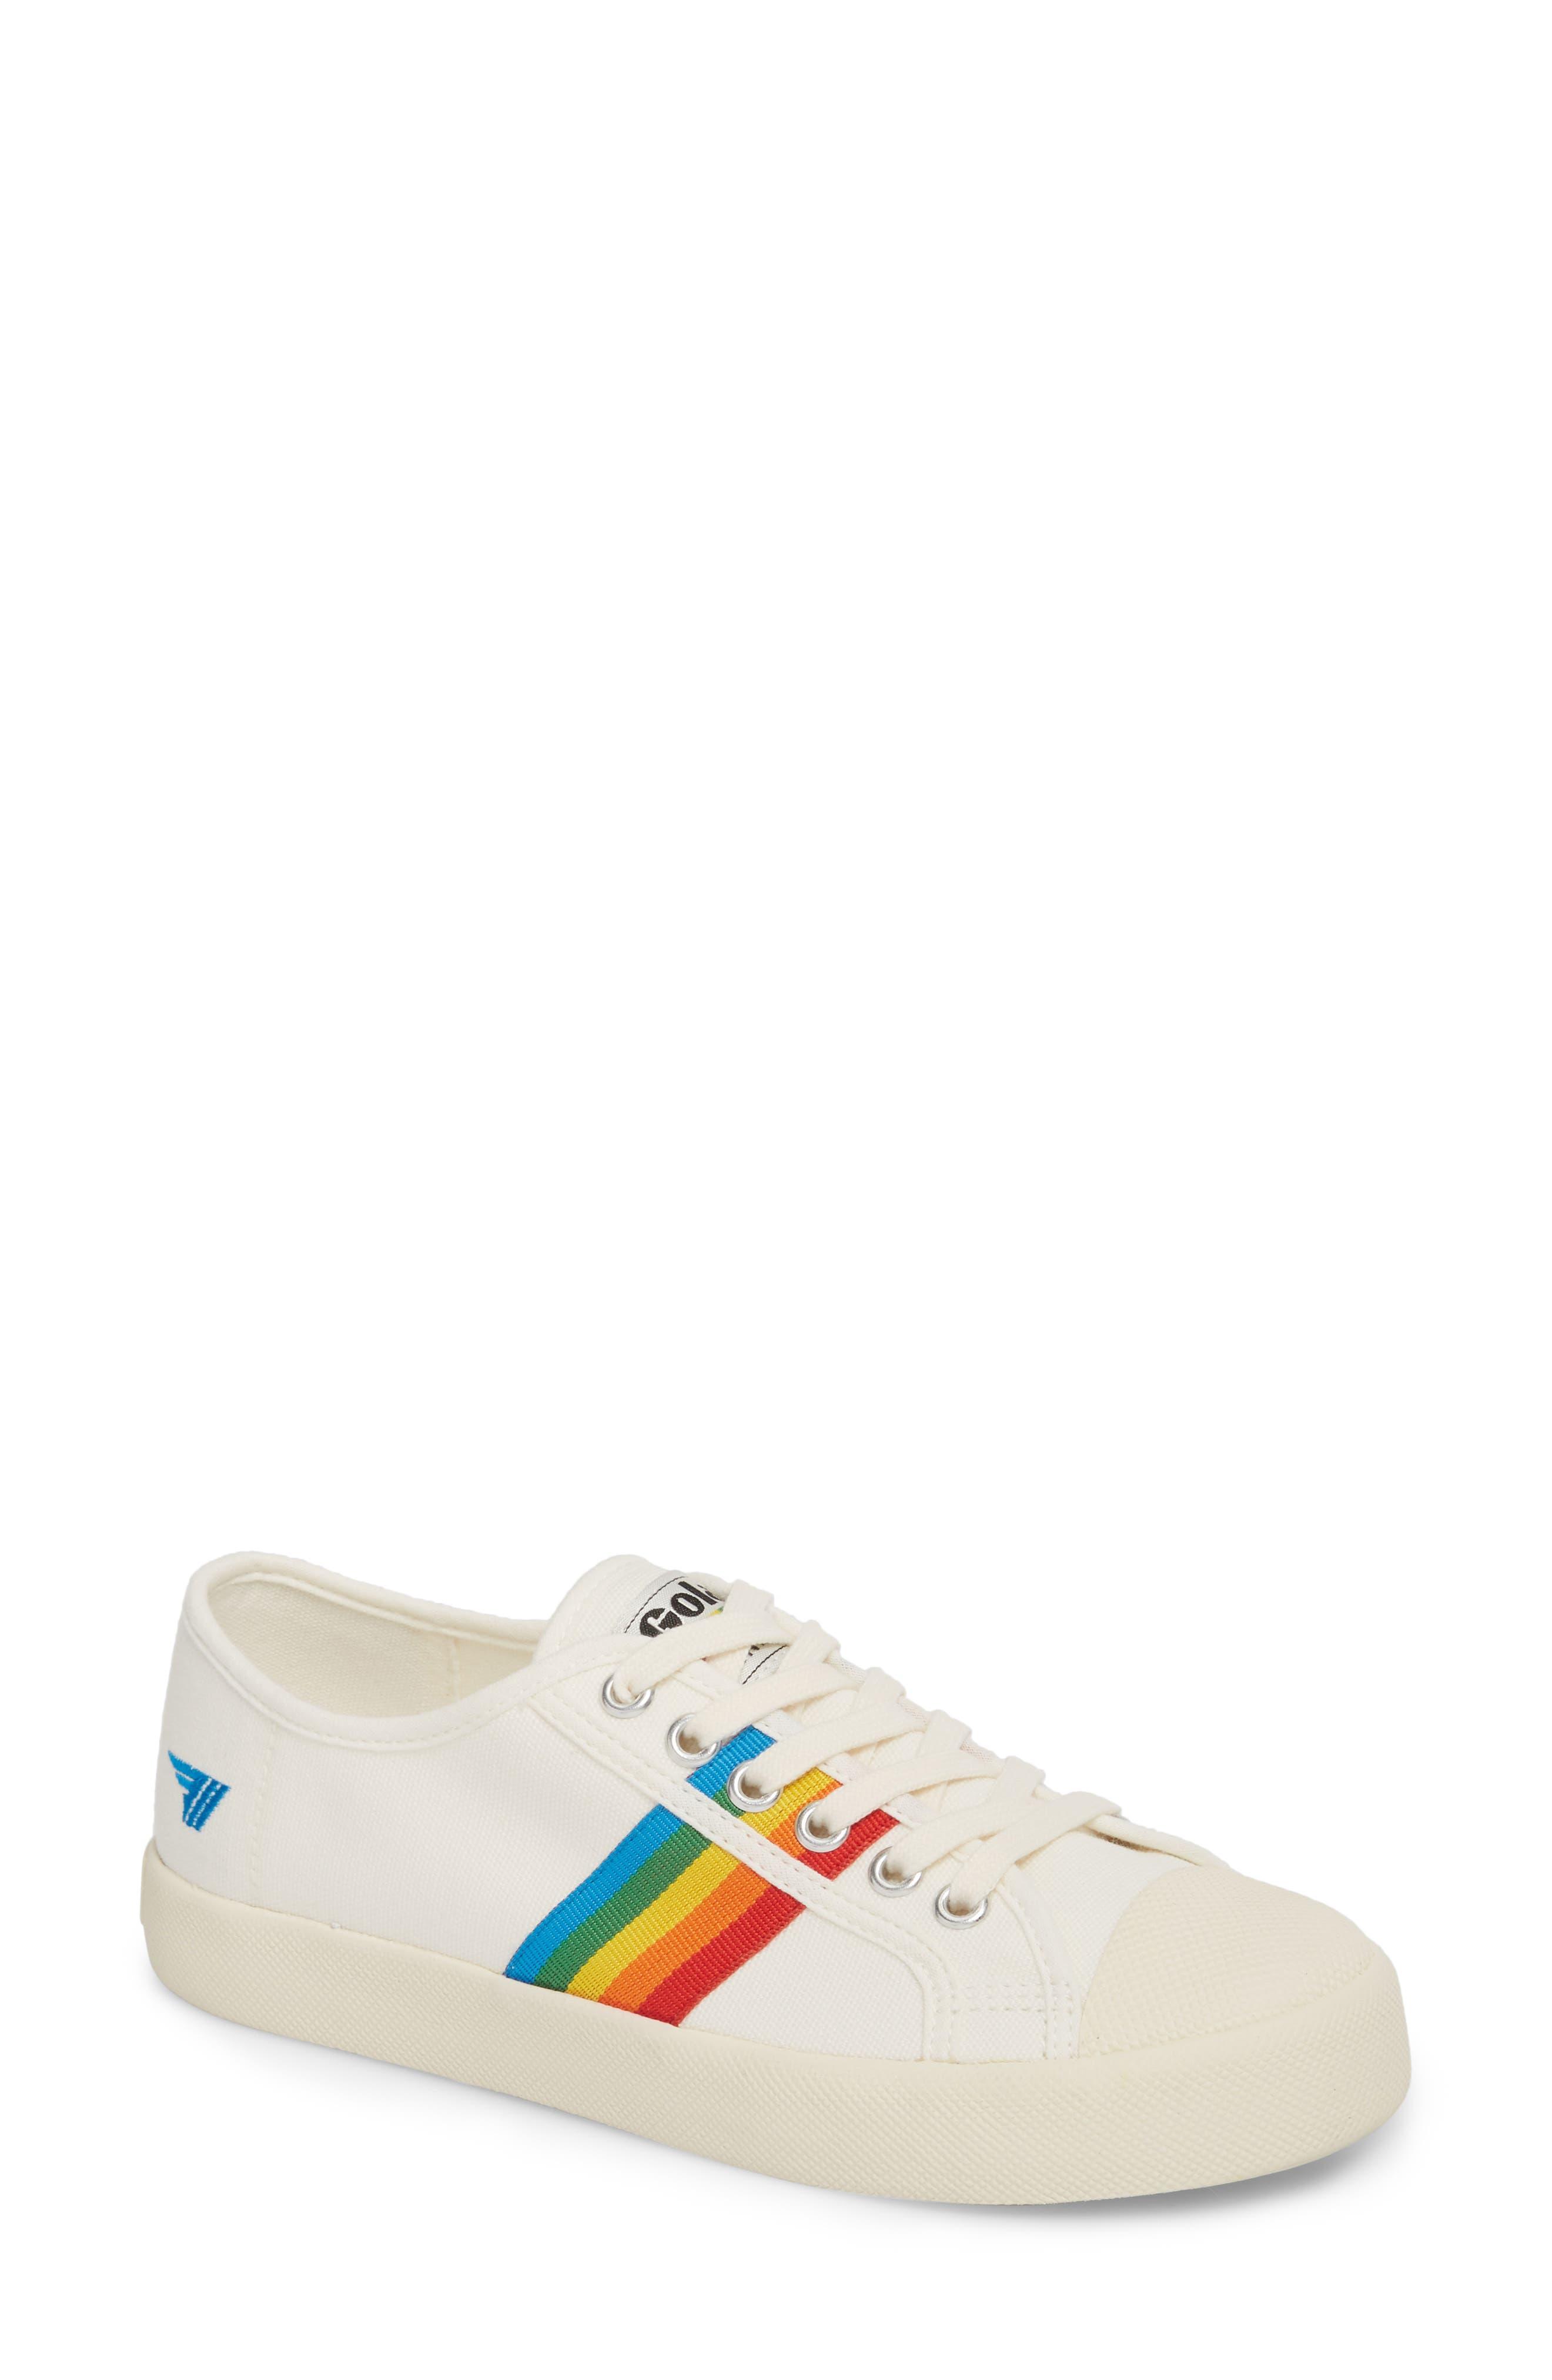 Gola Coaster Rainbow Striped Sneaker